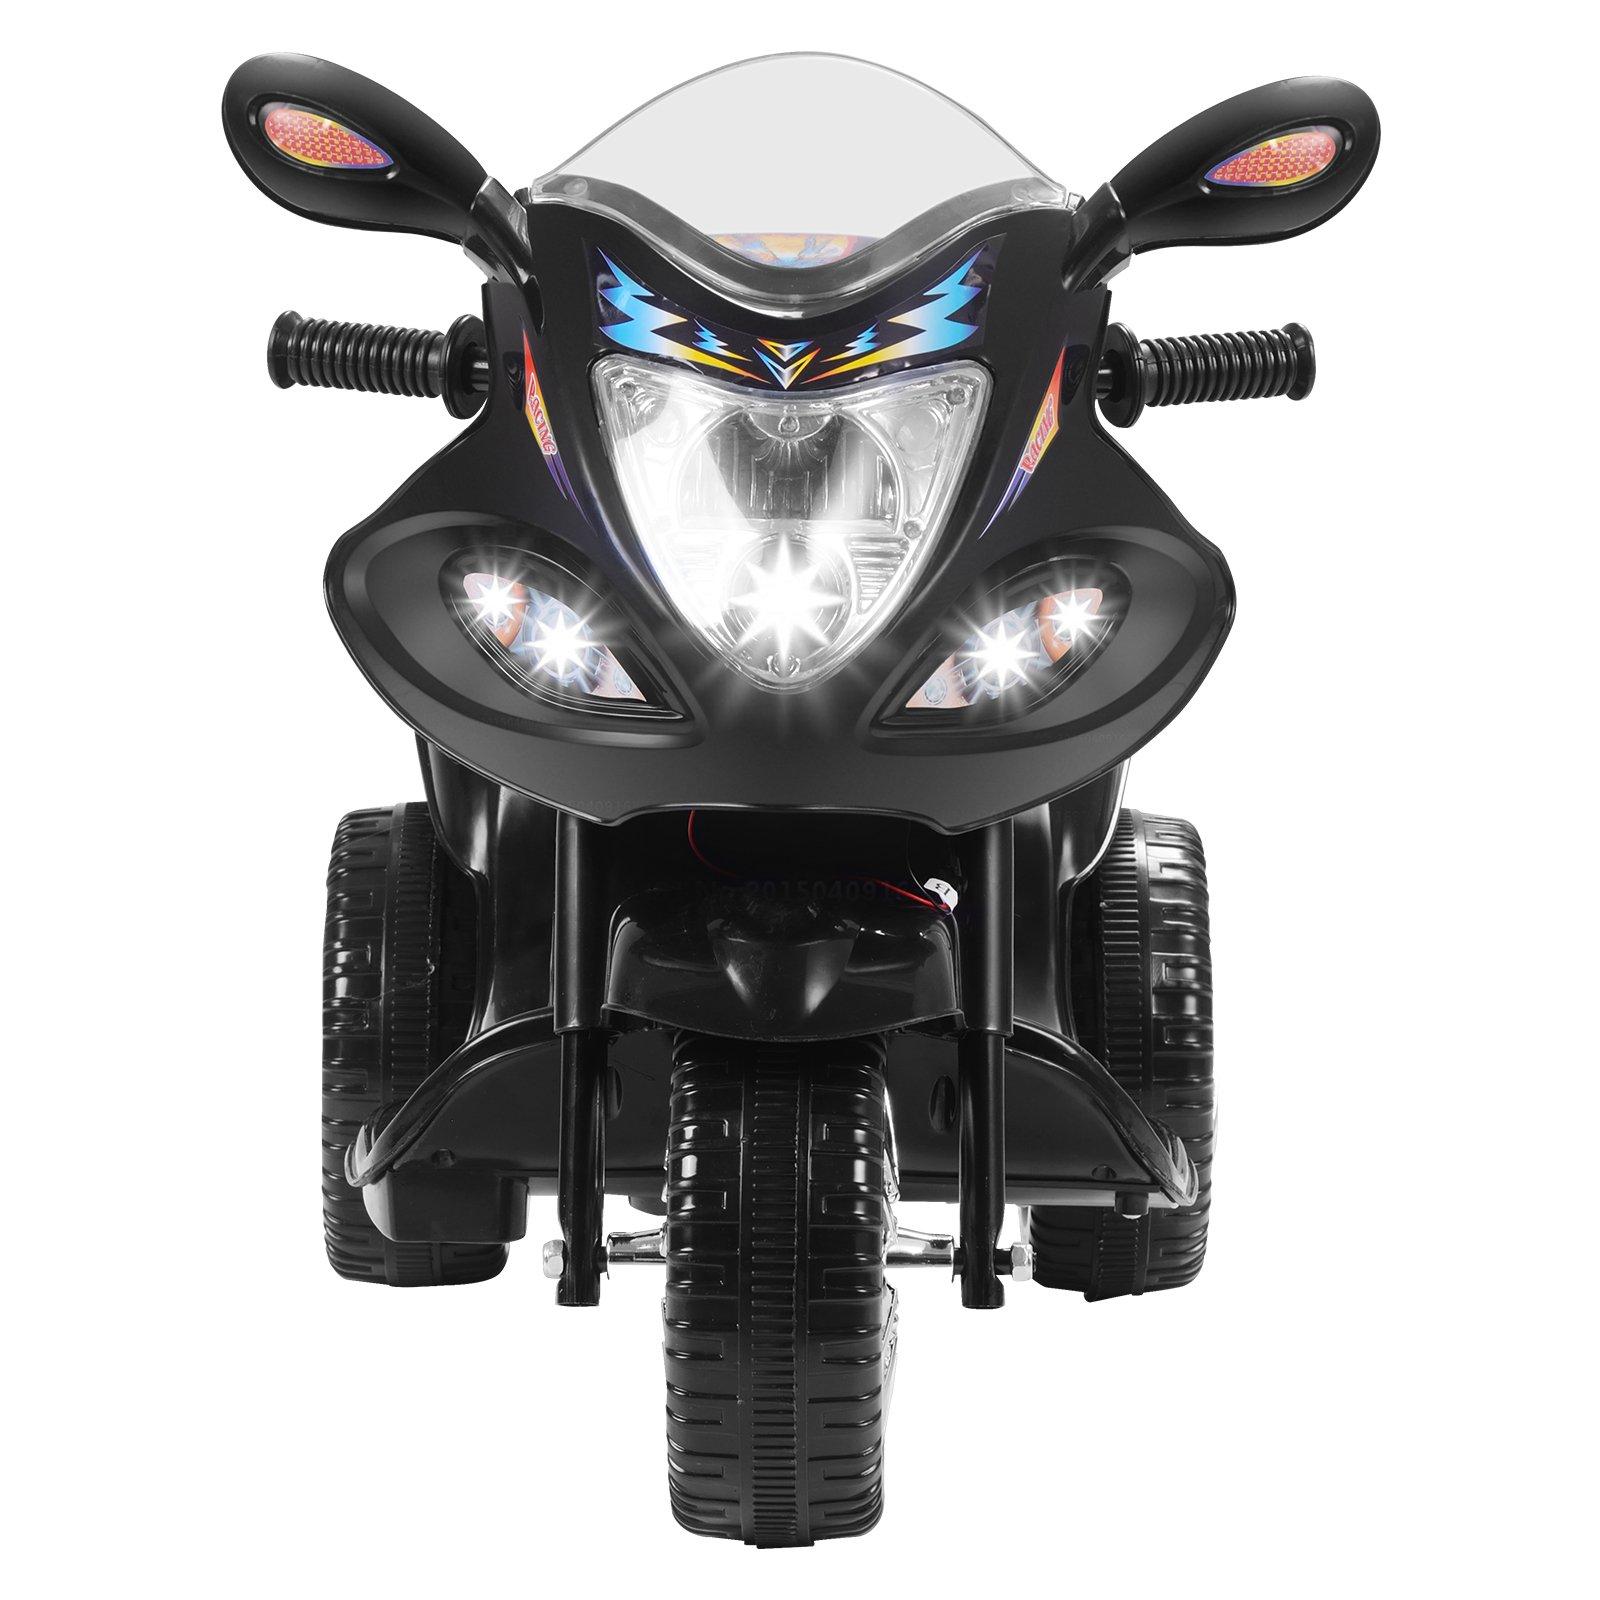 Uenjoy Murtisol Kids Ride on Motorcycle 6V Electric Motorcycle 2 Wheels Black by Uenjoy (Image #4)